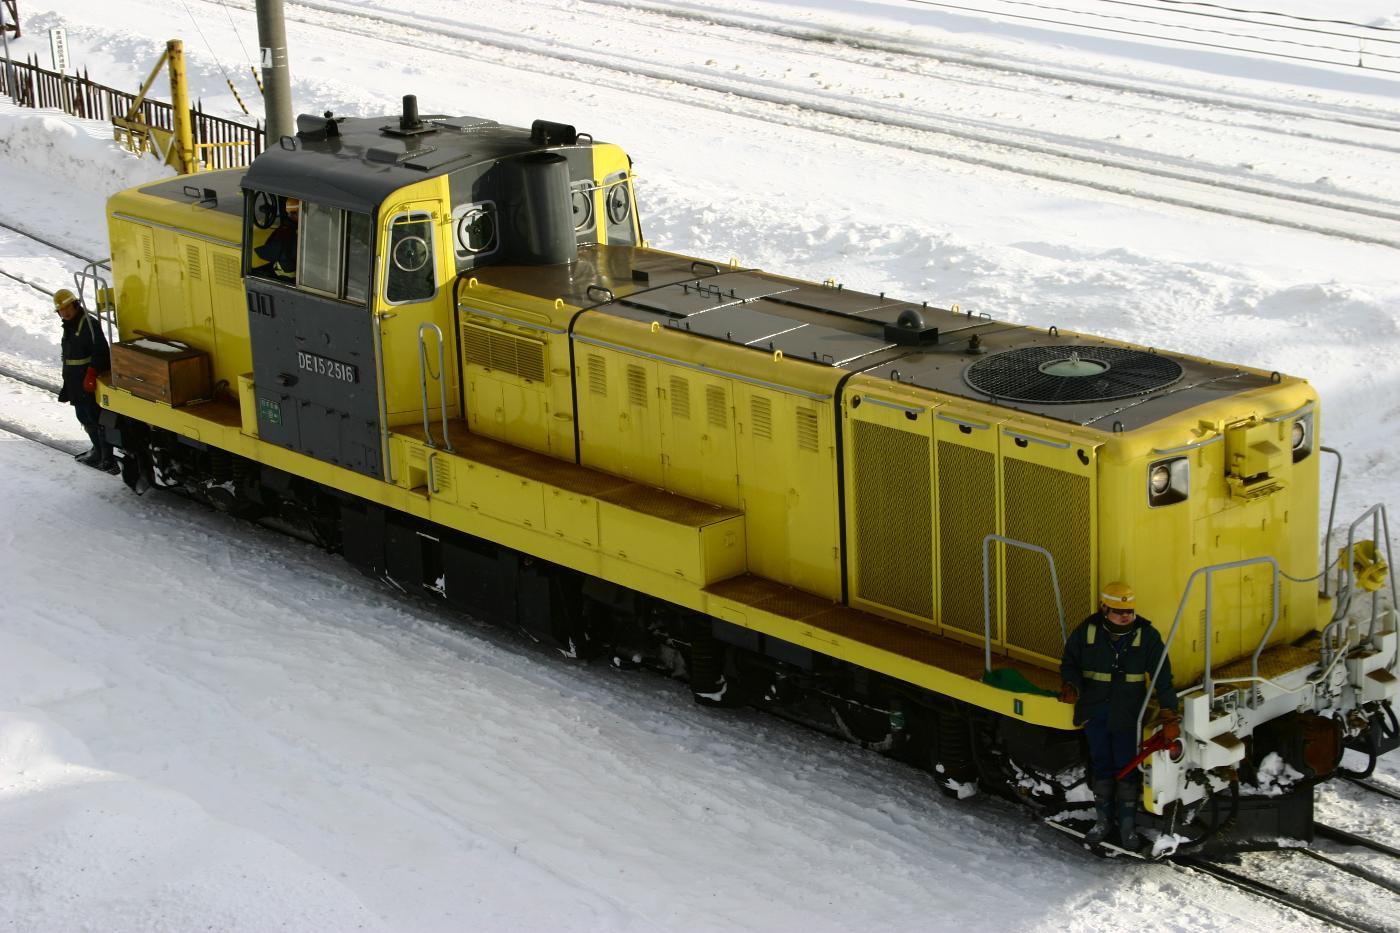 Jr120114004